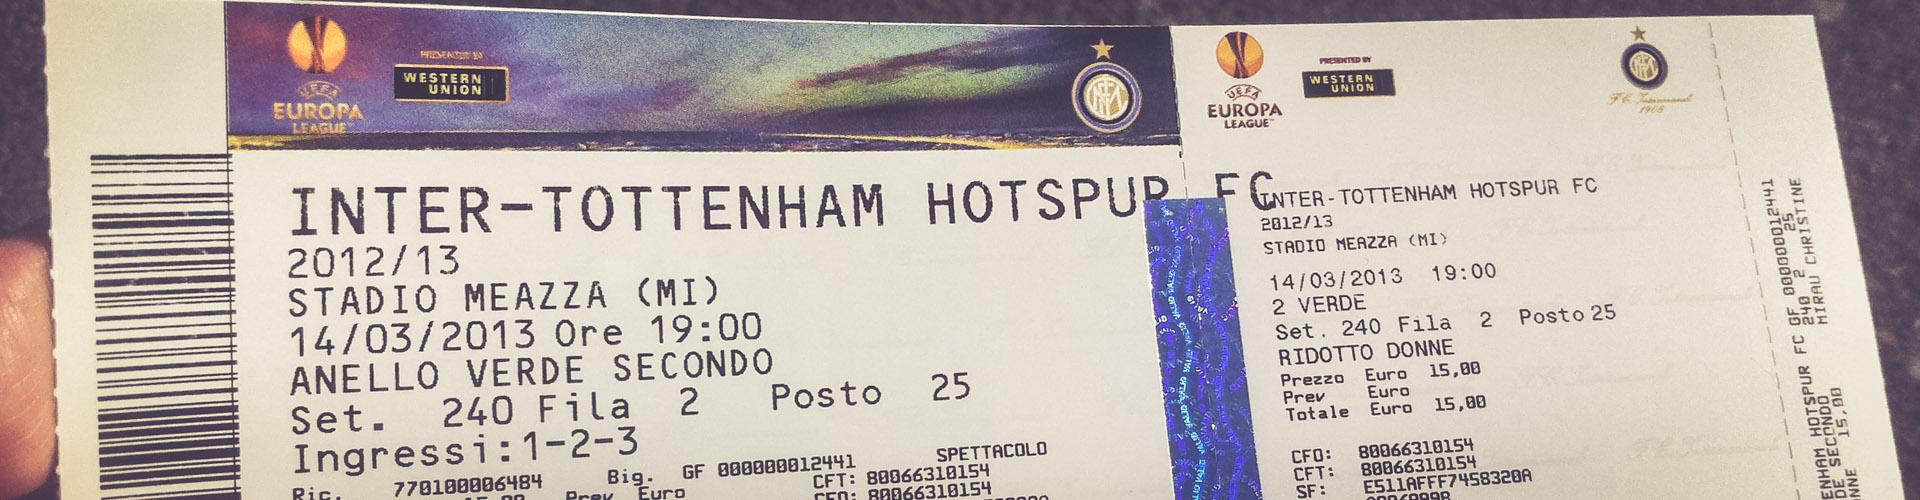 Stadio Giuseppe Meazza, Inter Mailand - Tottenham Hotspur